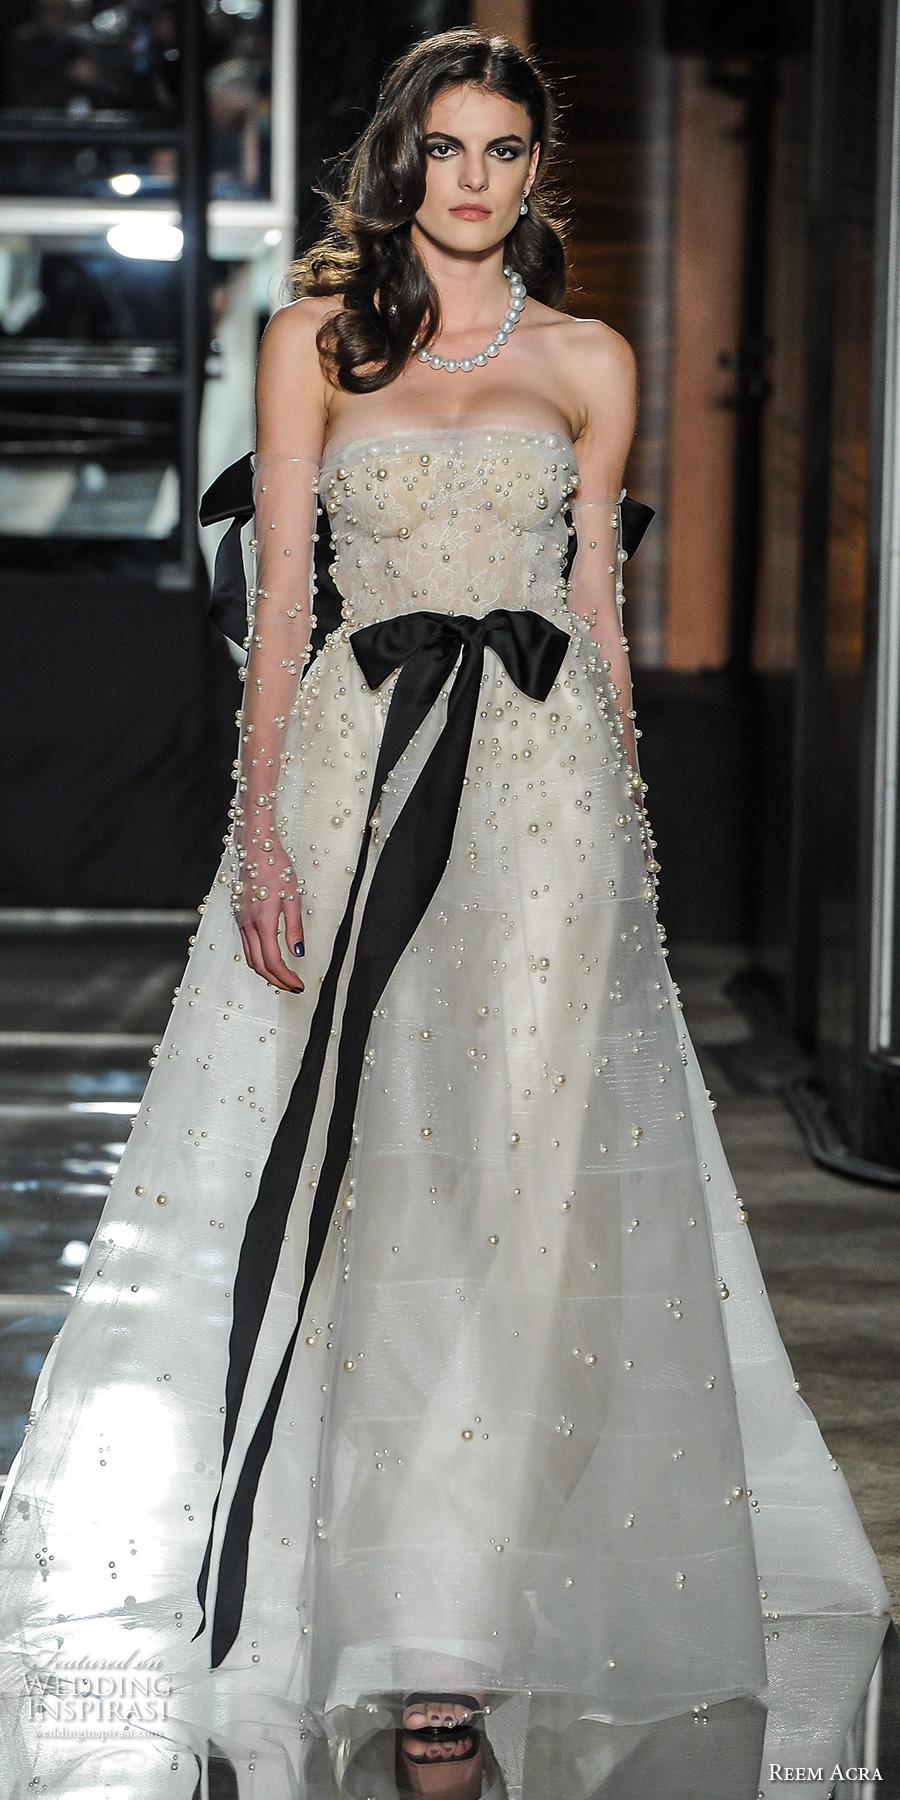 870efb4a1b1a Reem Acra Spring 2018 Wedding Dresses New York Bridal